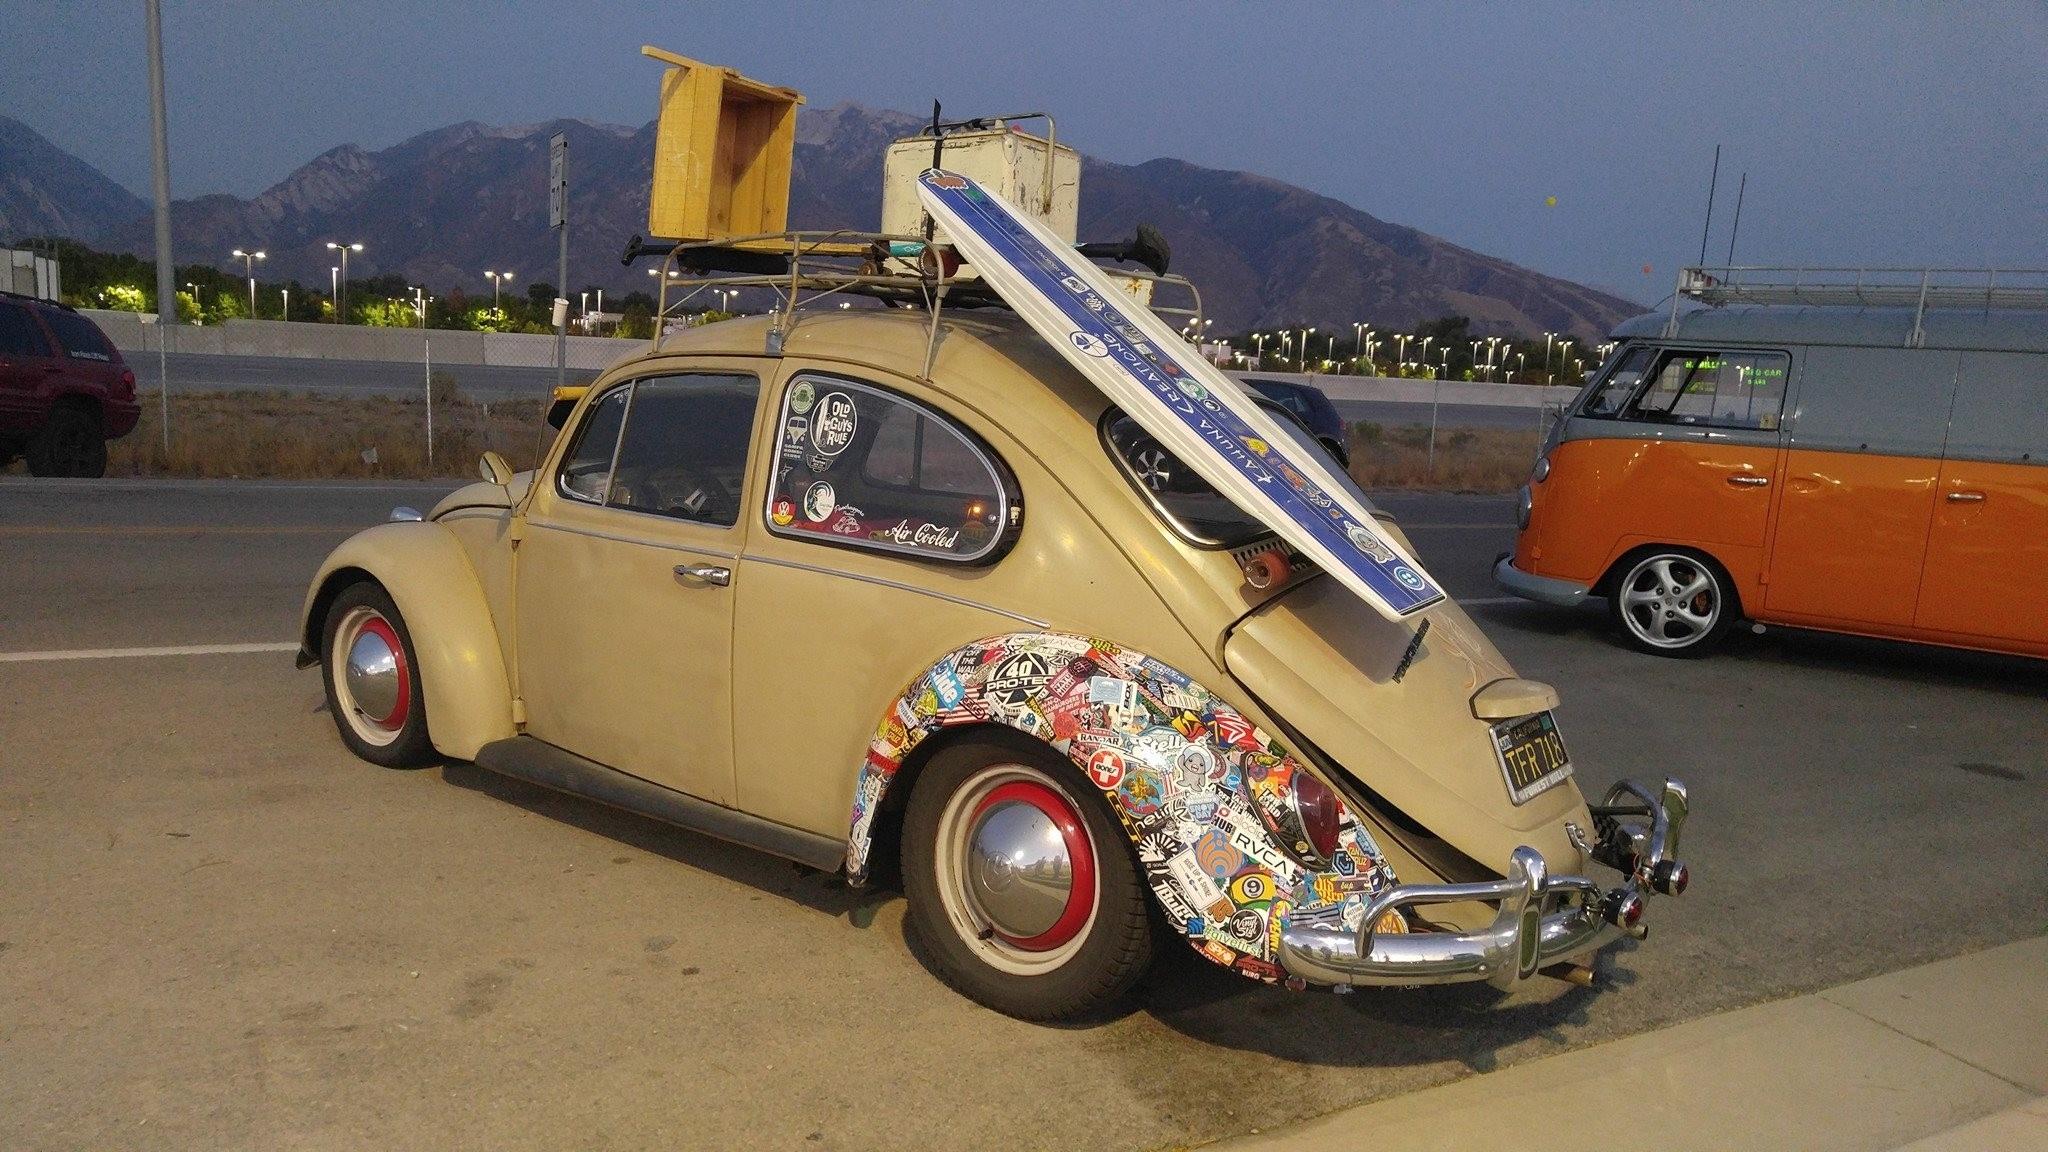 party vw pre utah classic beetle volkswagen southtowne